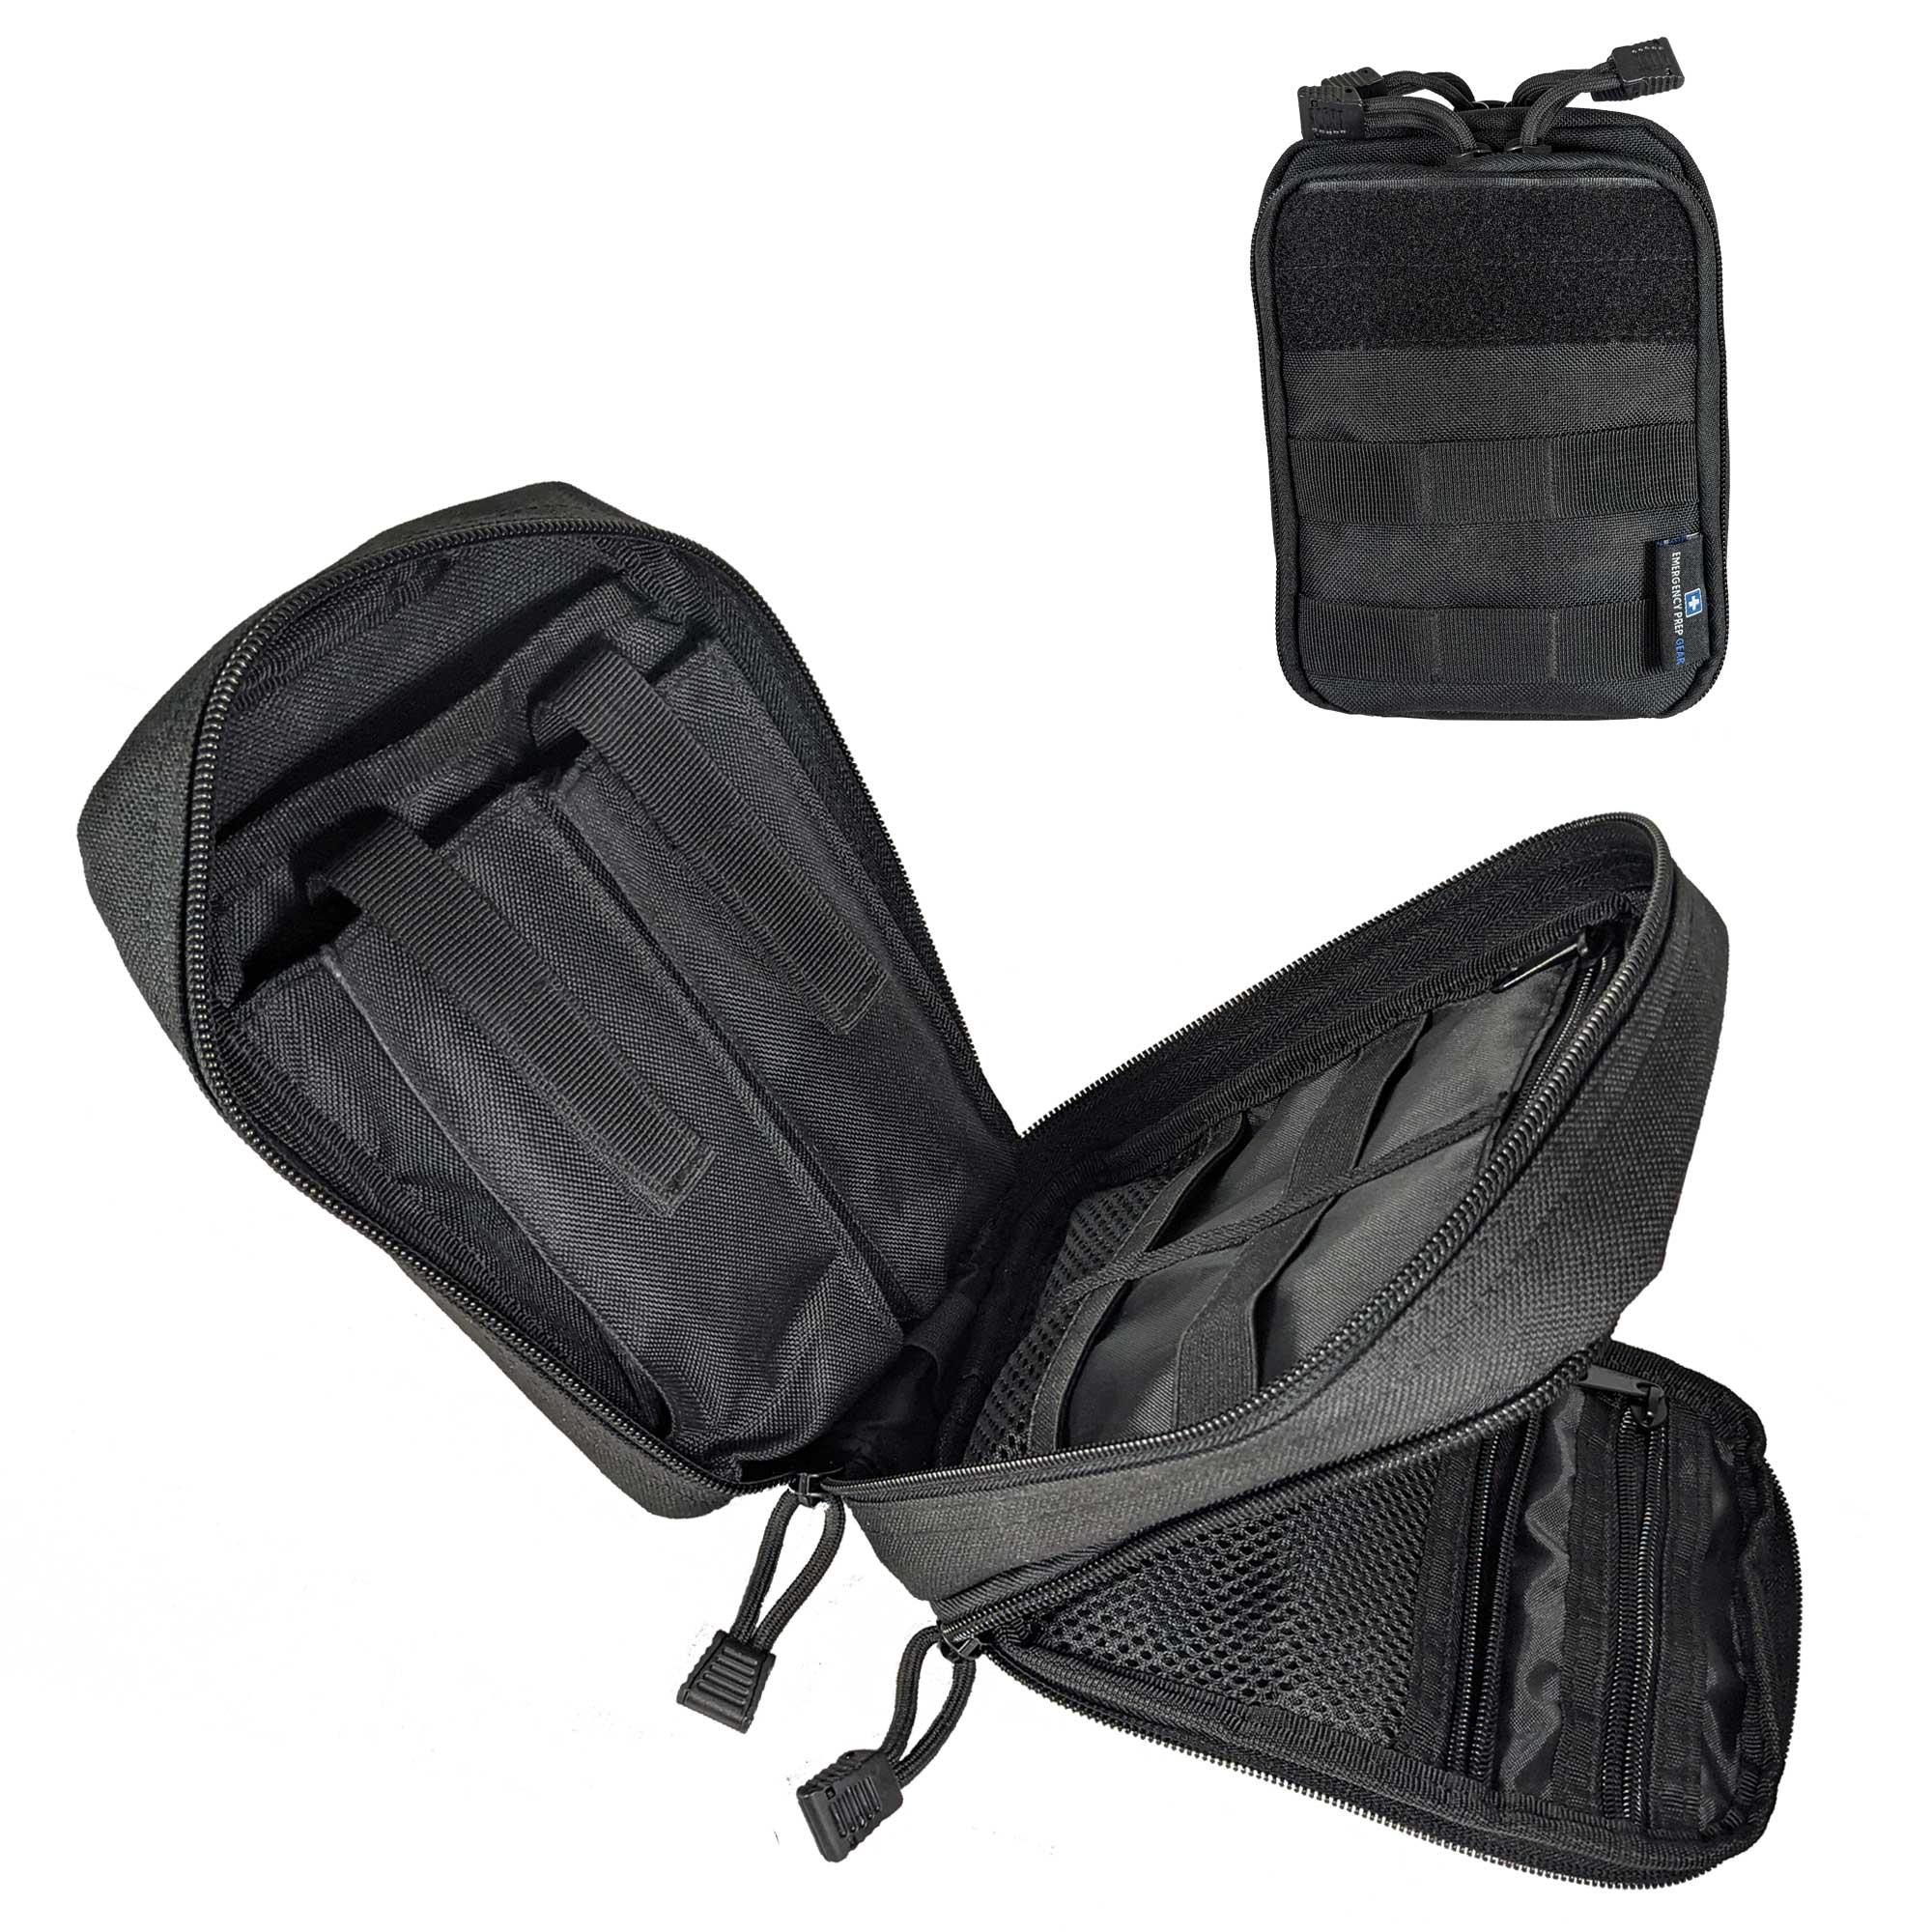 21 10 08 16 00 56 original b09dr49ctv epg gear compact black main